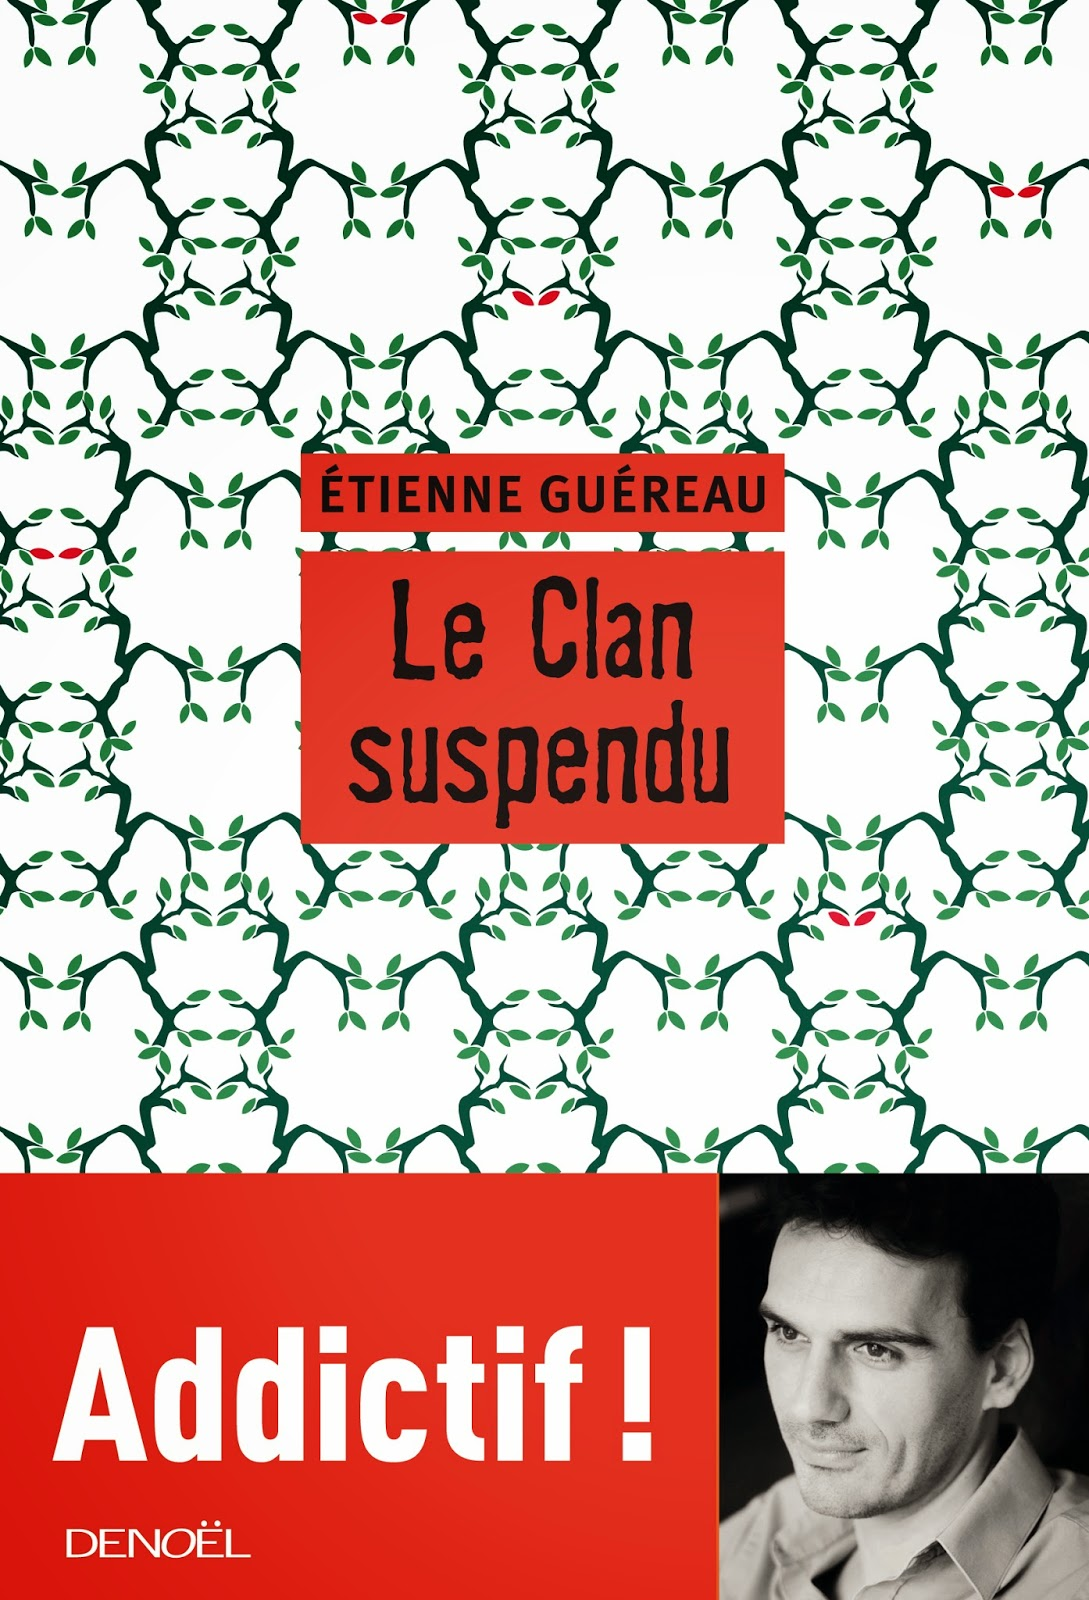 http://antredeslivres.blogspot.fr/2014/09/le-clan-suspendu.html